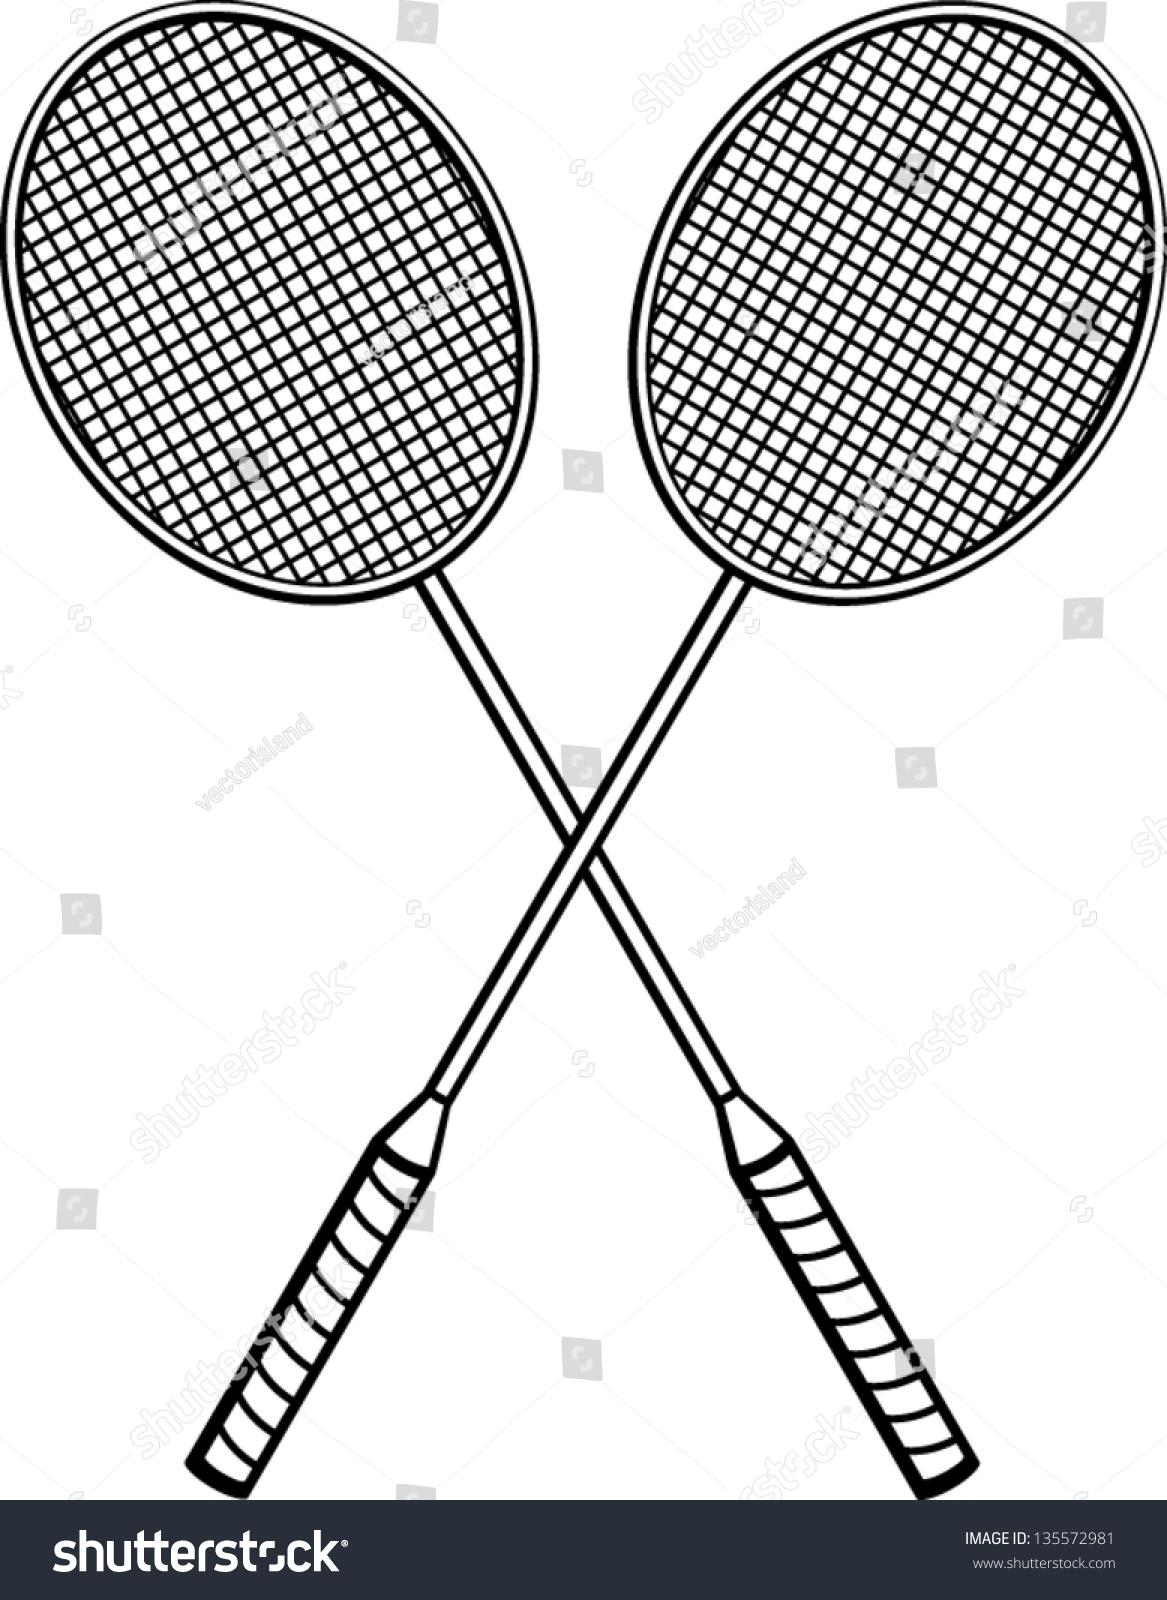 Badminton racquets drawing